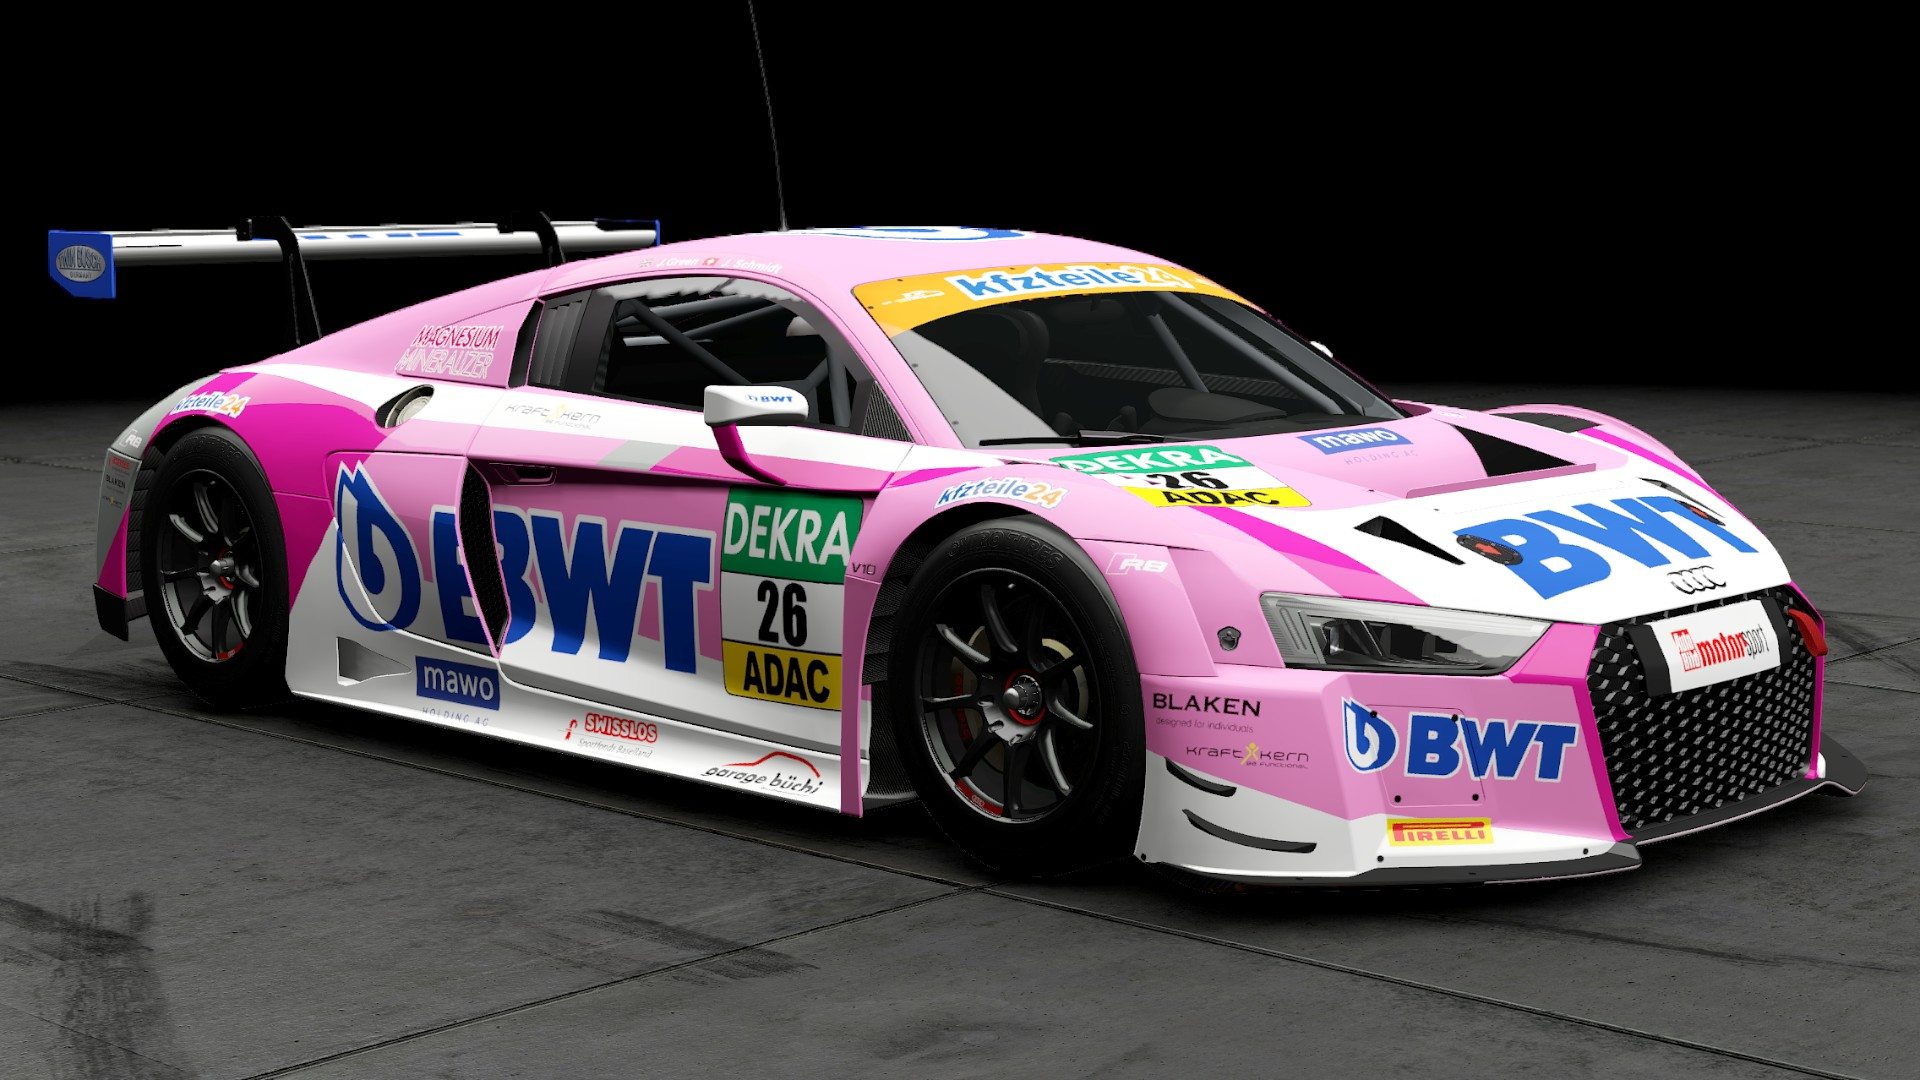 Paul Miller Porsche >> -Project CARS 2- 【カスタムカラー(スキン)の紹介-4】 - オヤジの備忘録